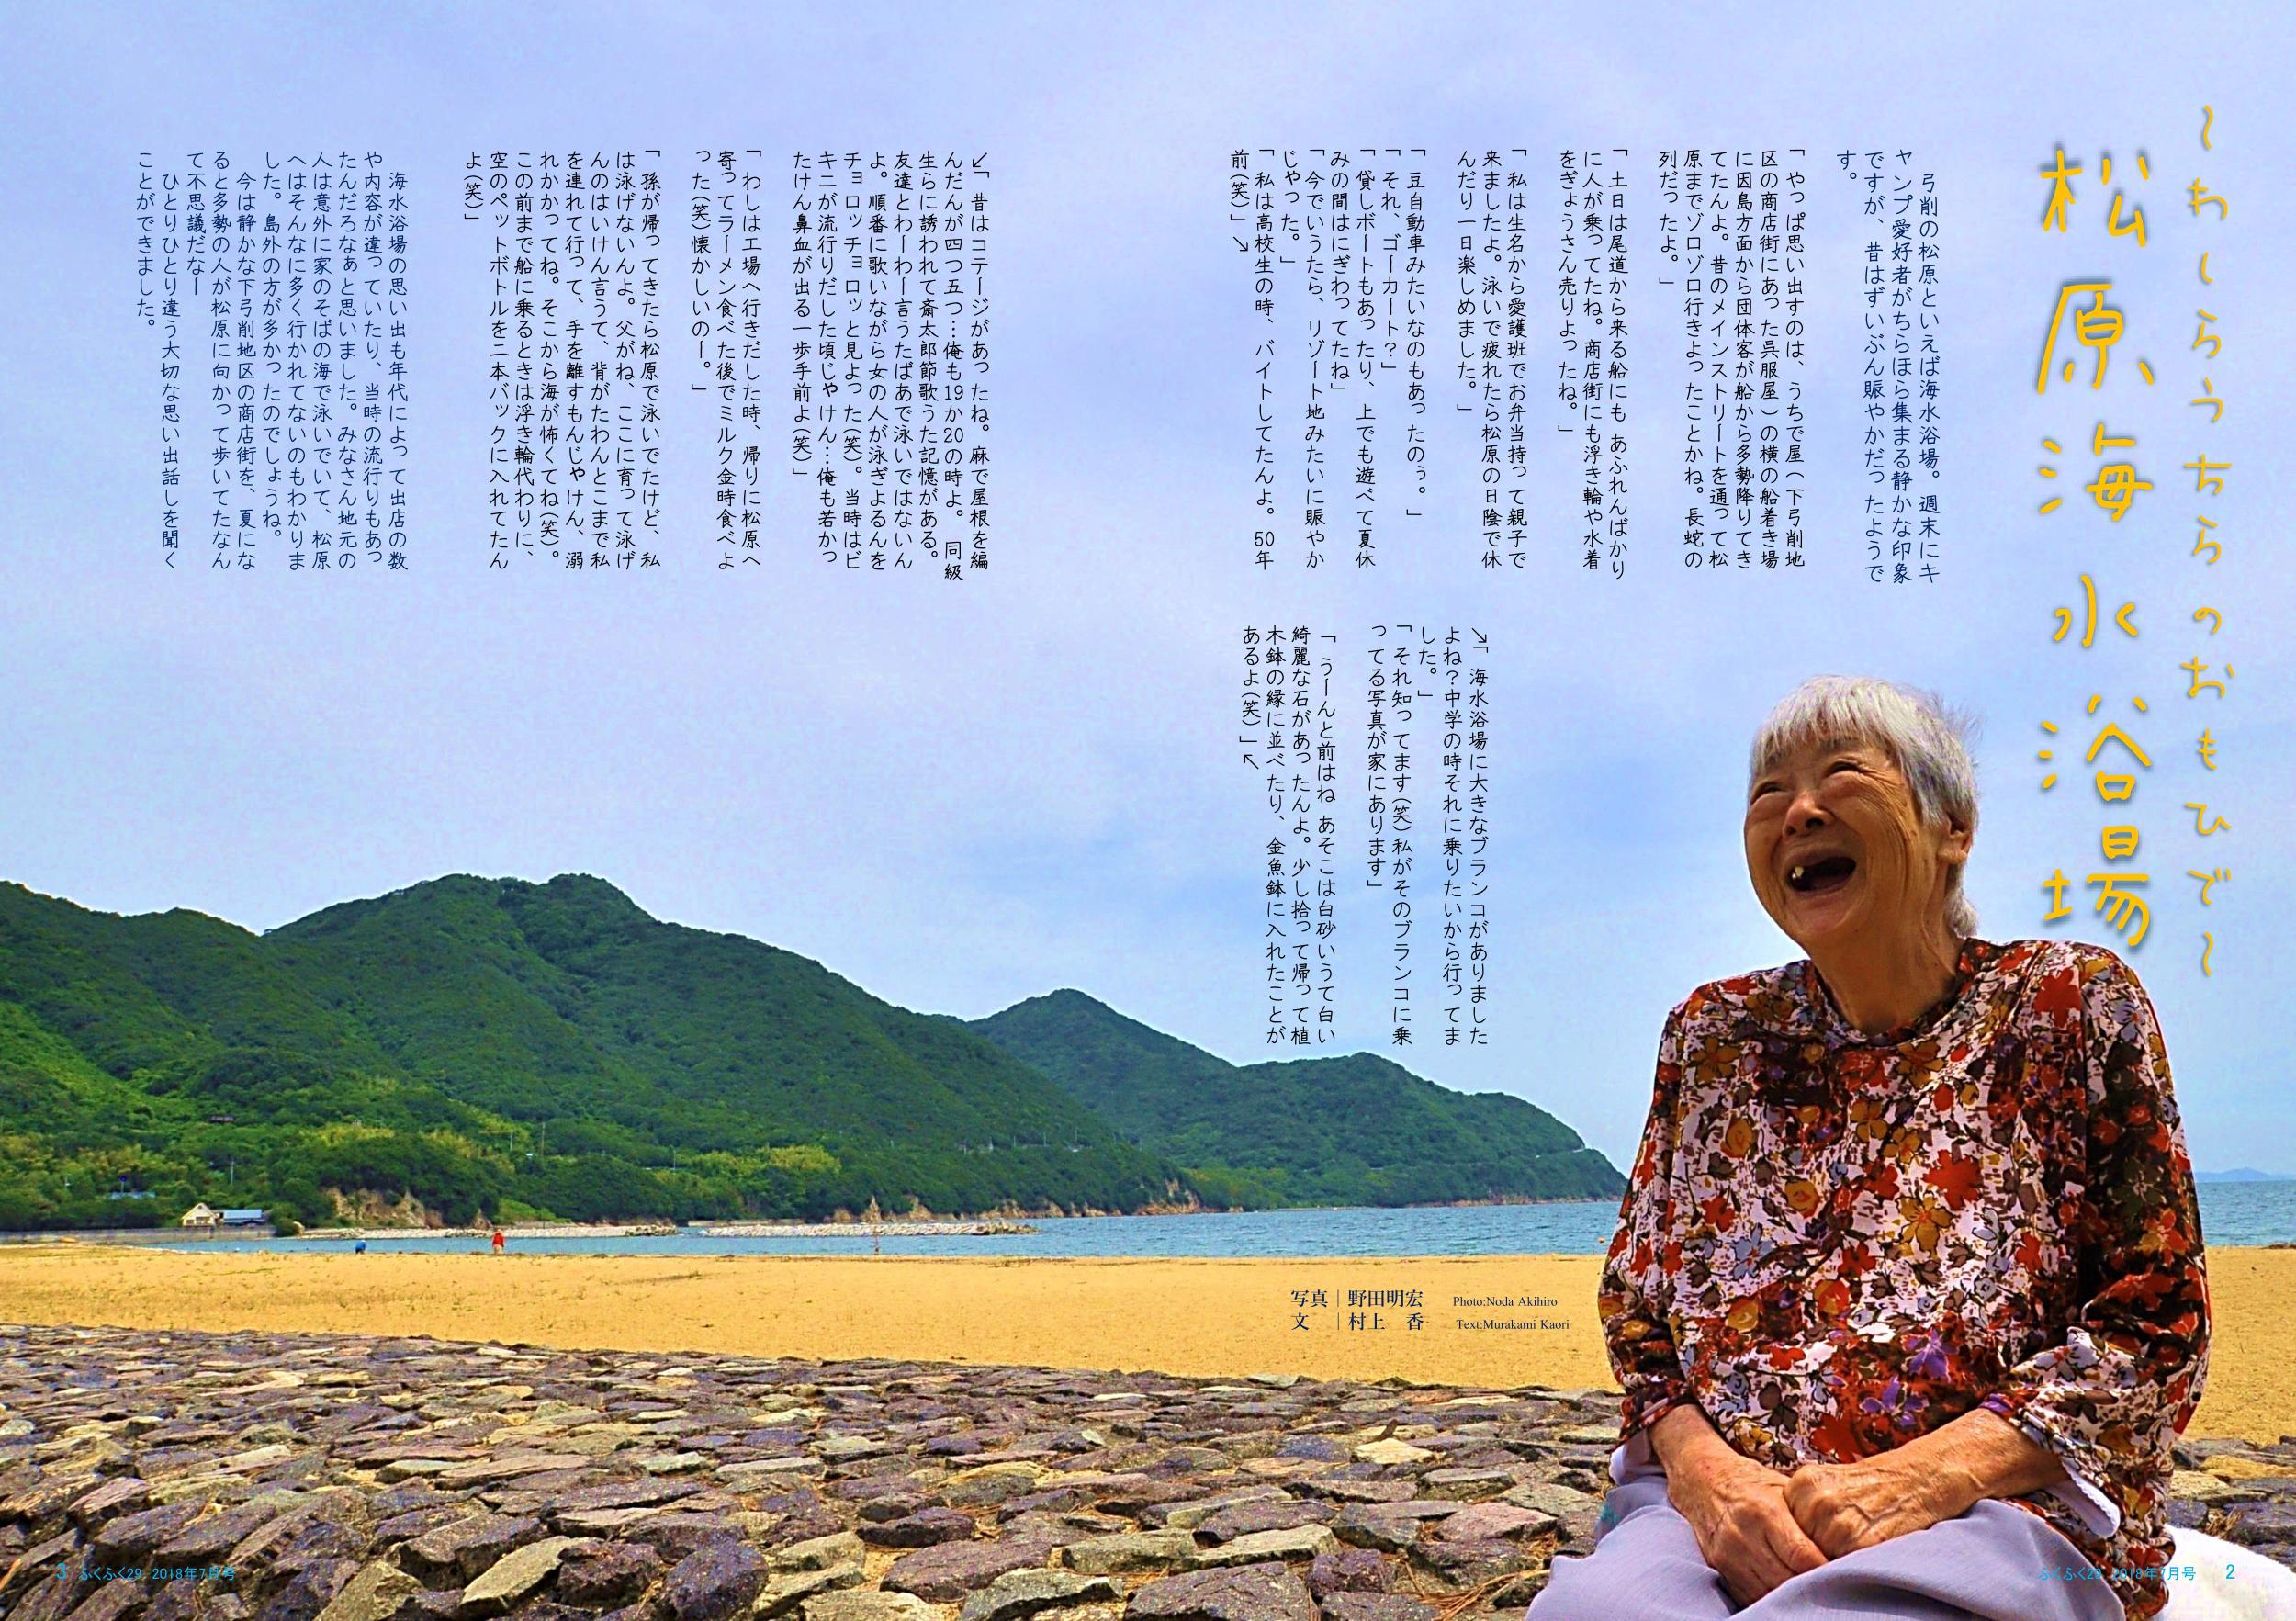 http://fukufukunokai.com/newsletter/images/7%E6%9C%88%E5%8F%B7%E5%85%A5%E7%A8%BF_cropped_2.jpeg